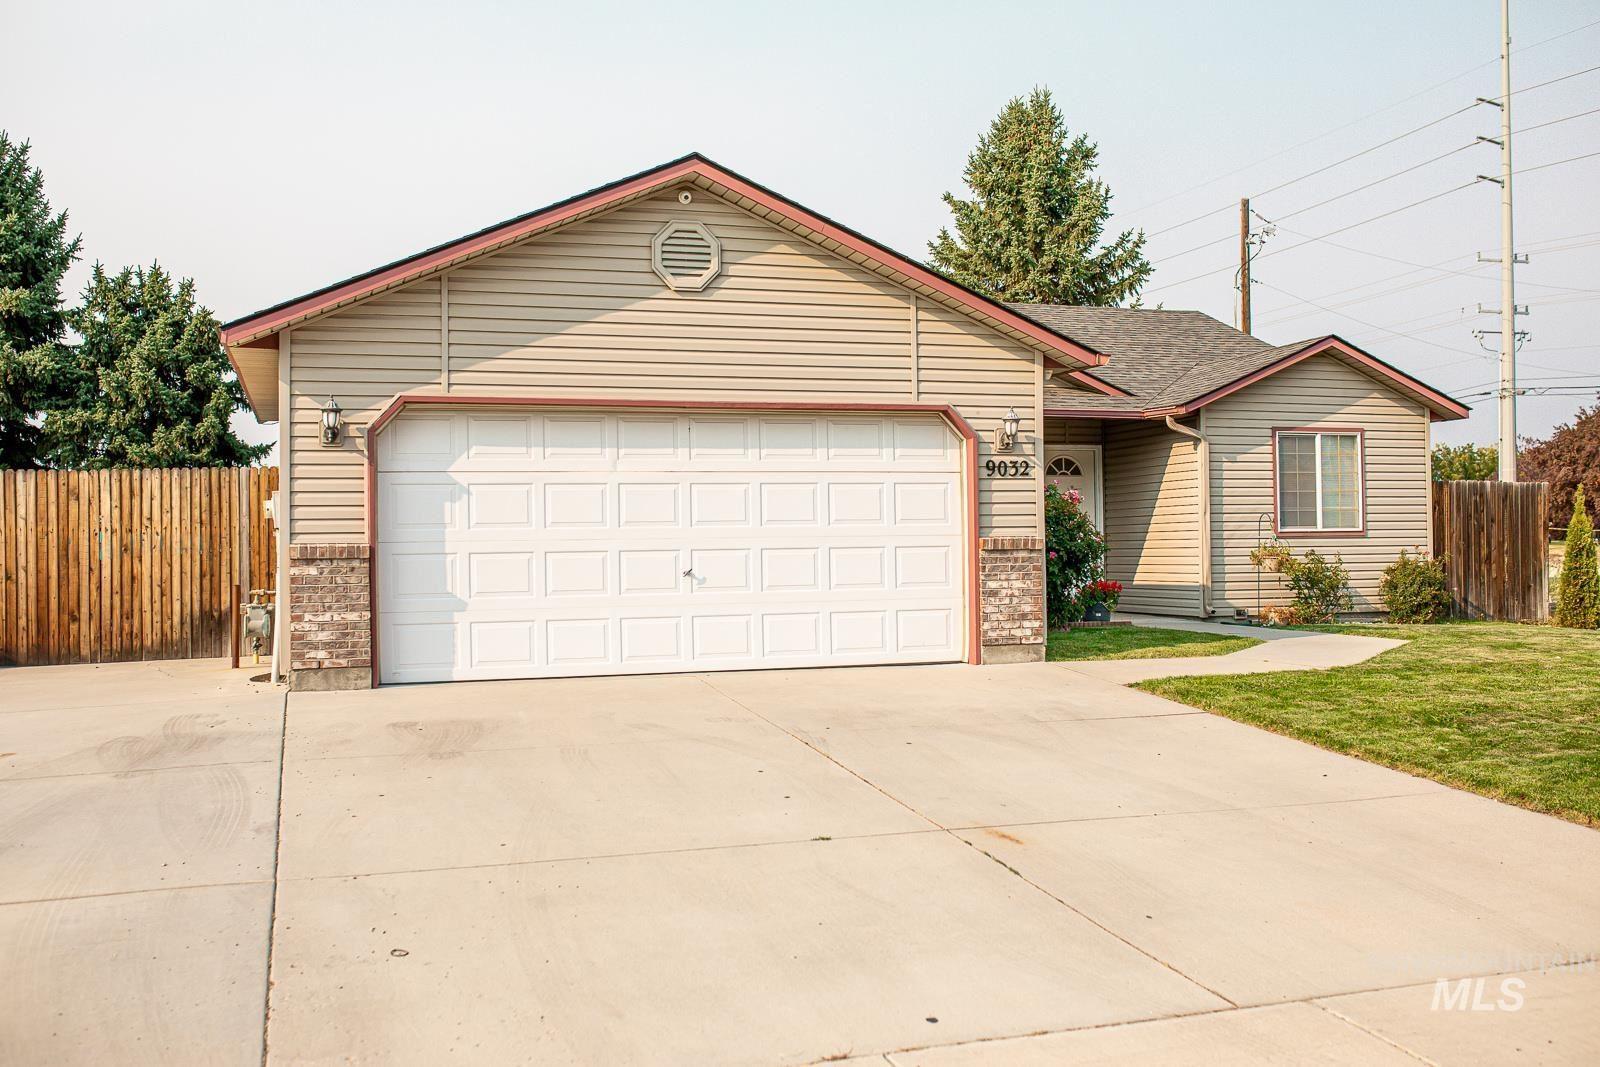 9032 W Cannel Island, Boise, ID 83709 - MLS#: 98818426